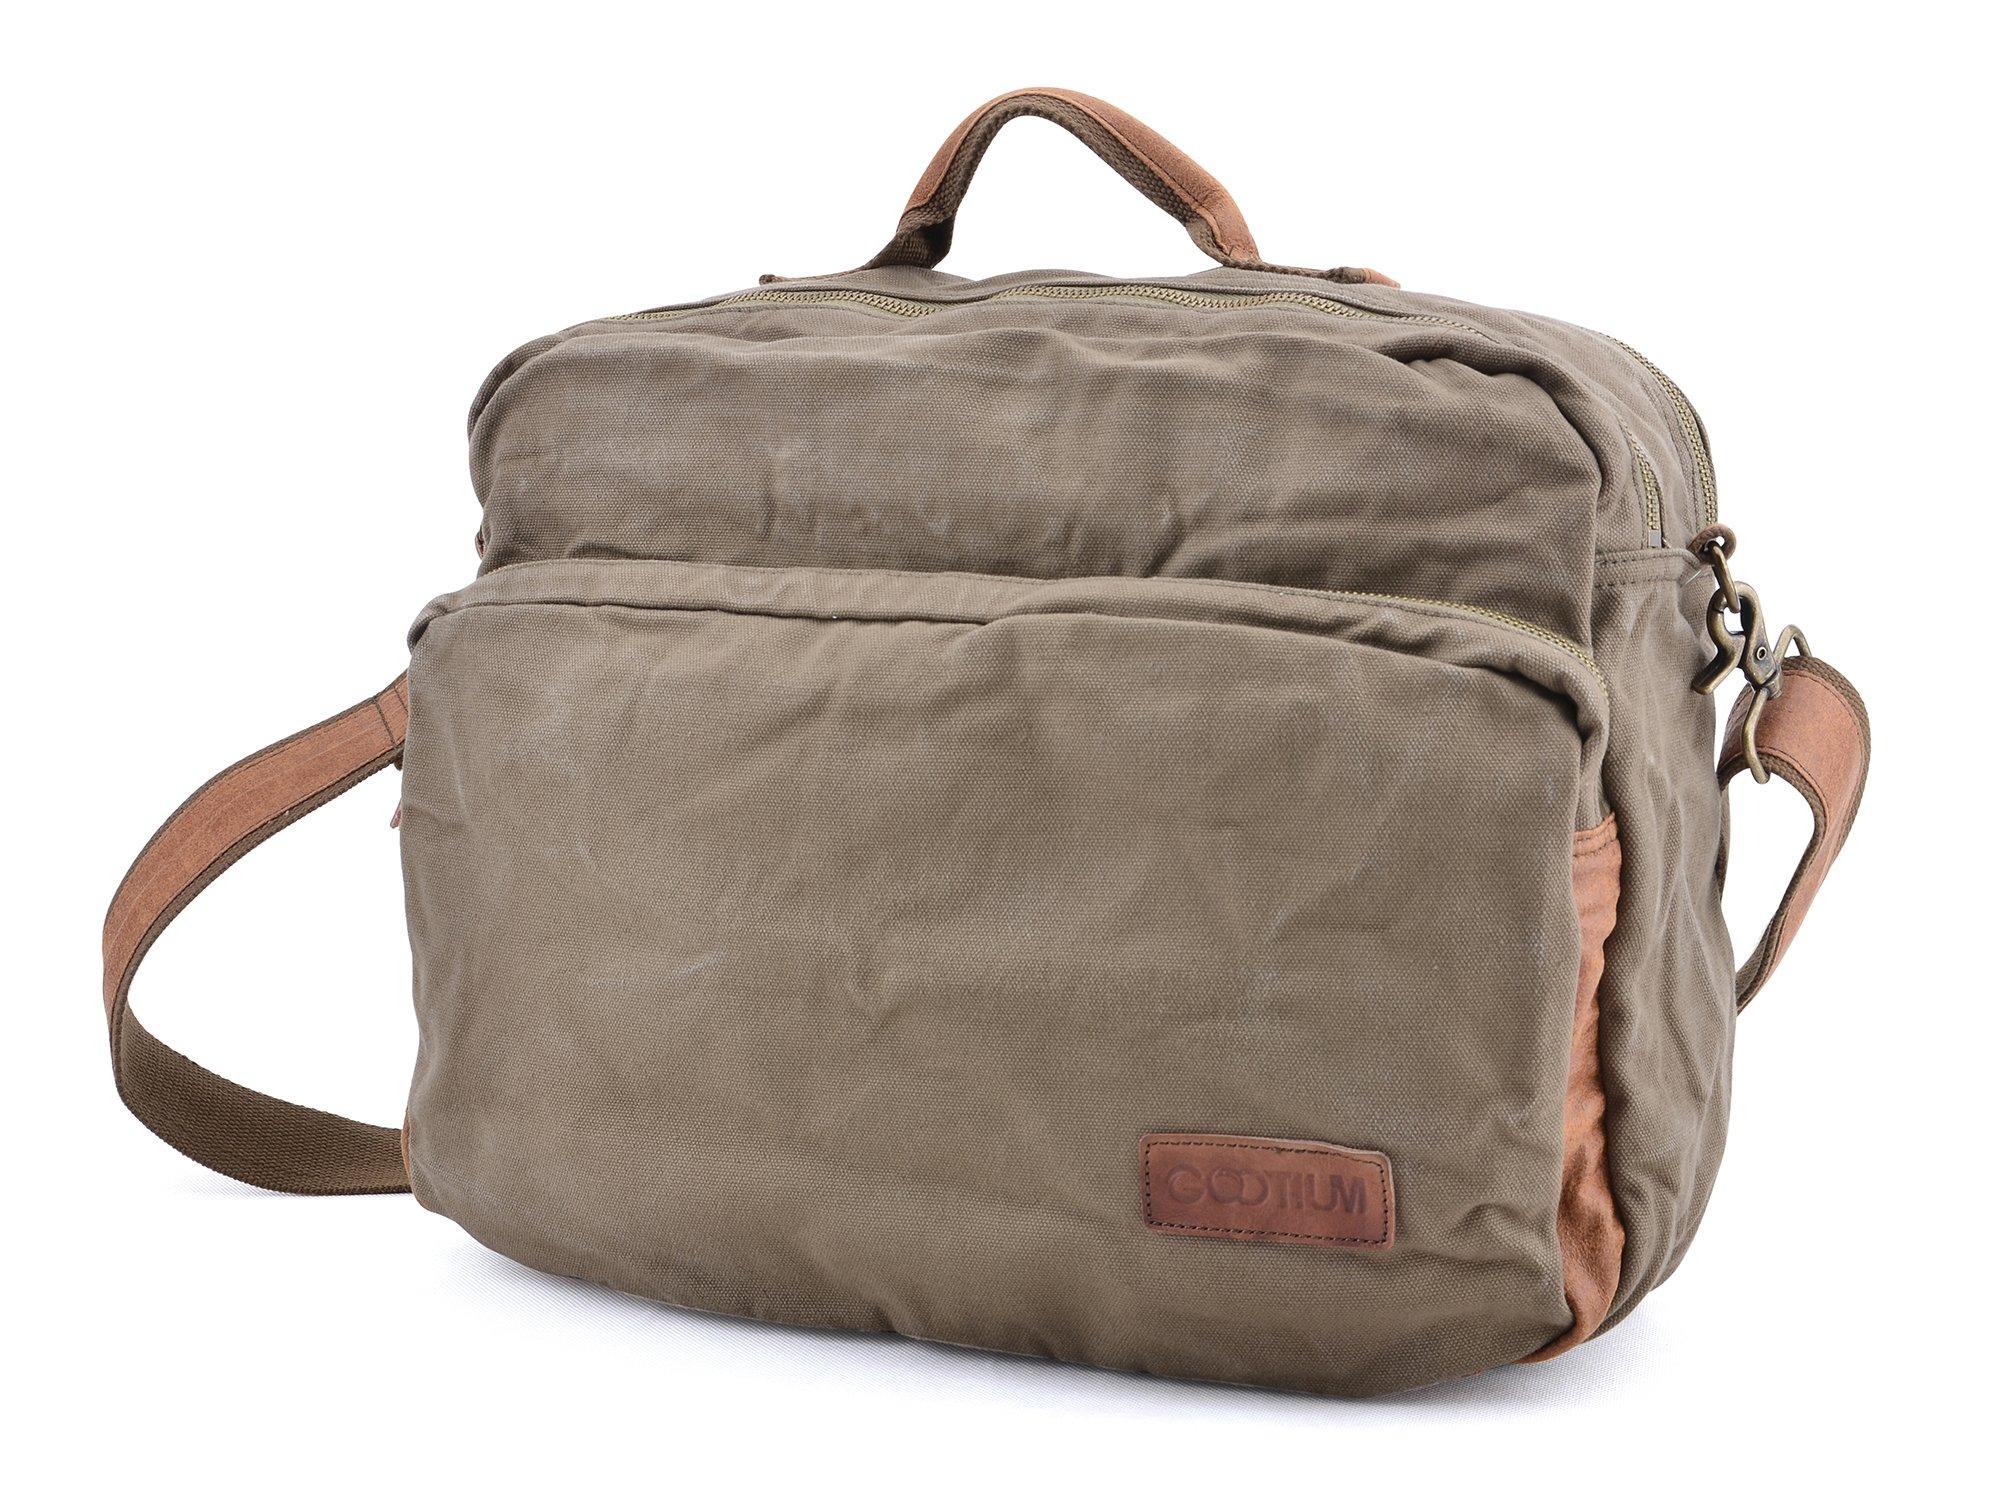 Gootium Canvas Laptop Shoulder Messenger Bag - Leather Handles for Men and Women, Army Green